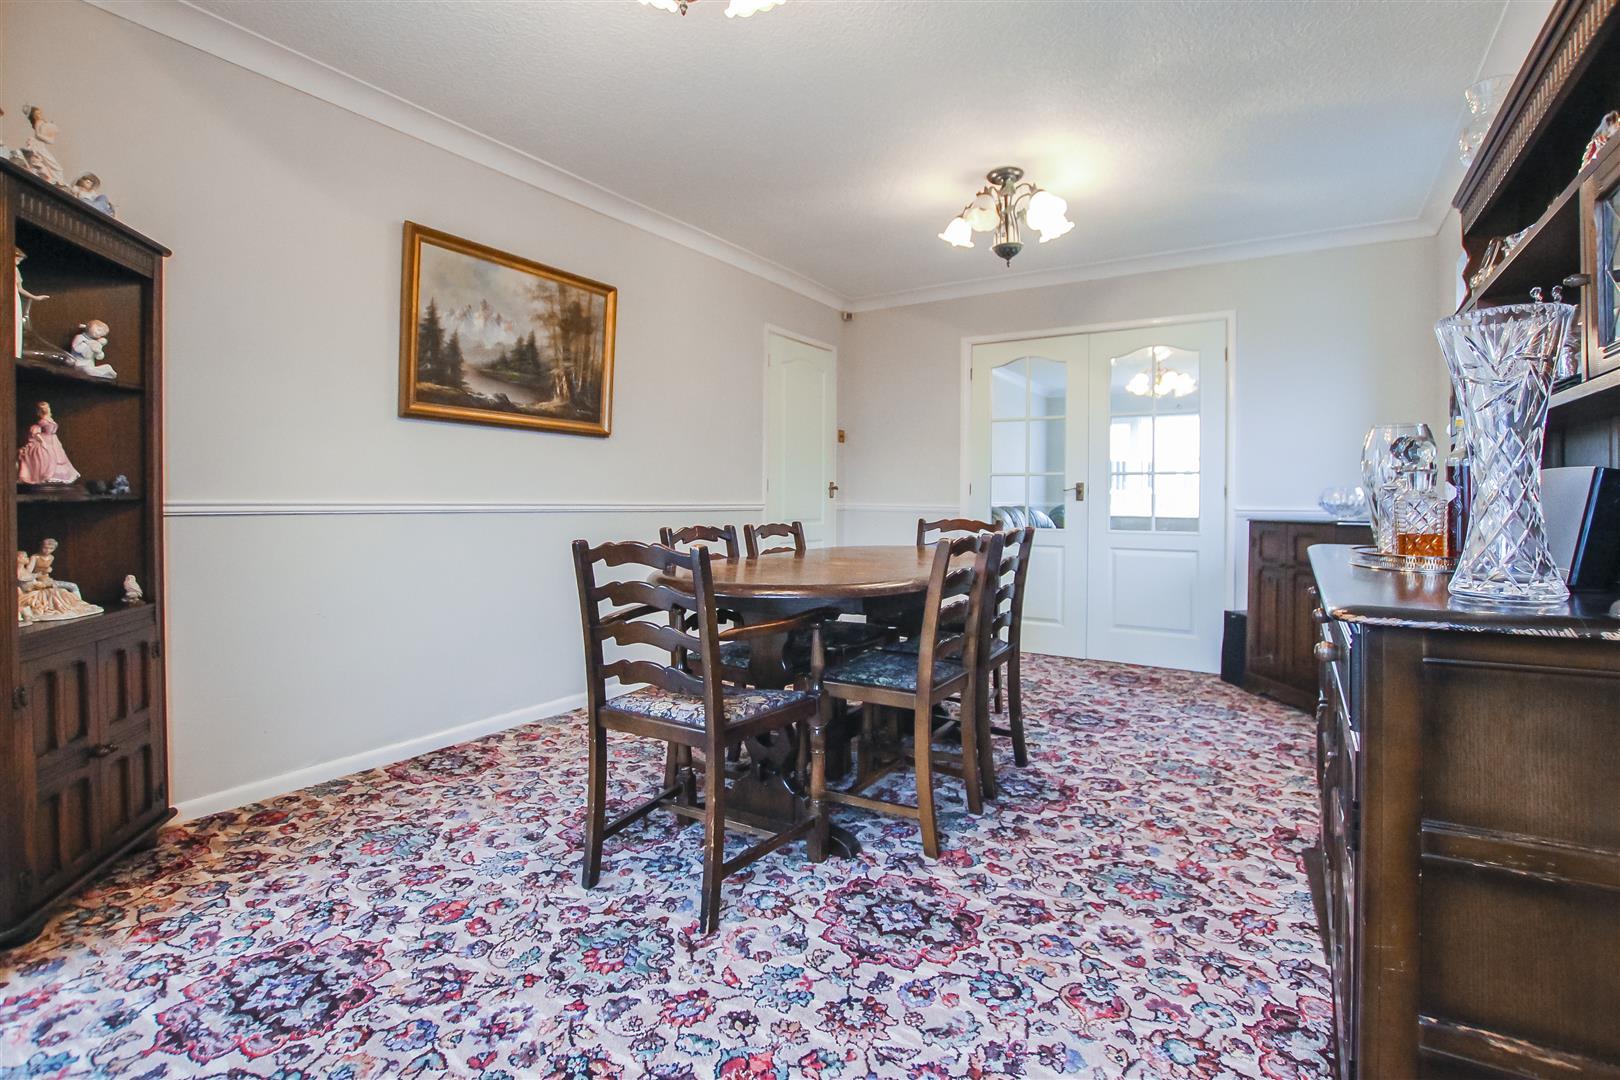 5 Bedroom Detached House For Sale - Dining Room